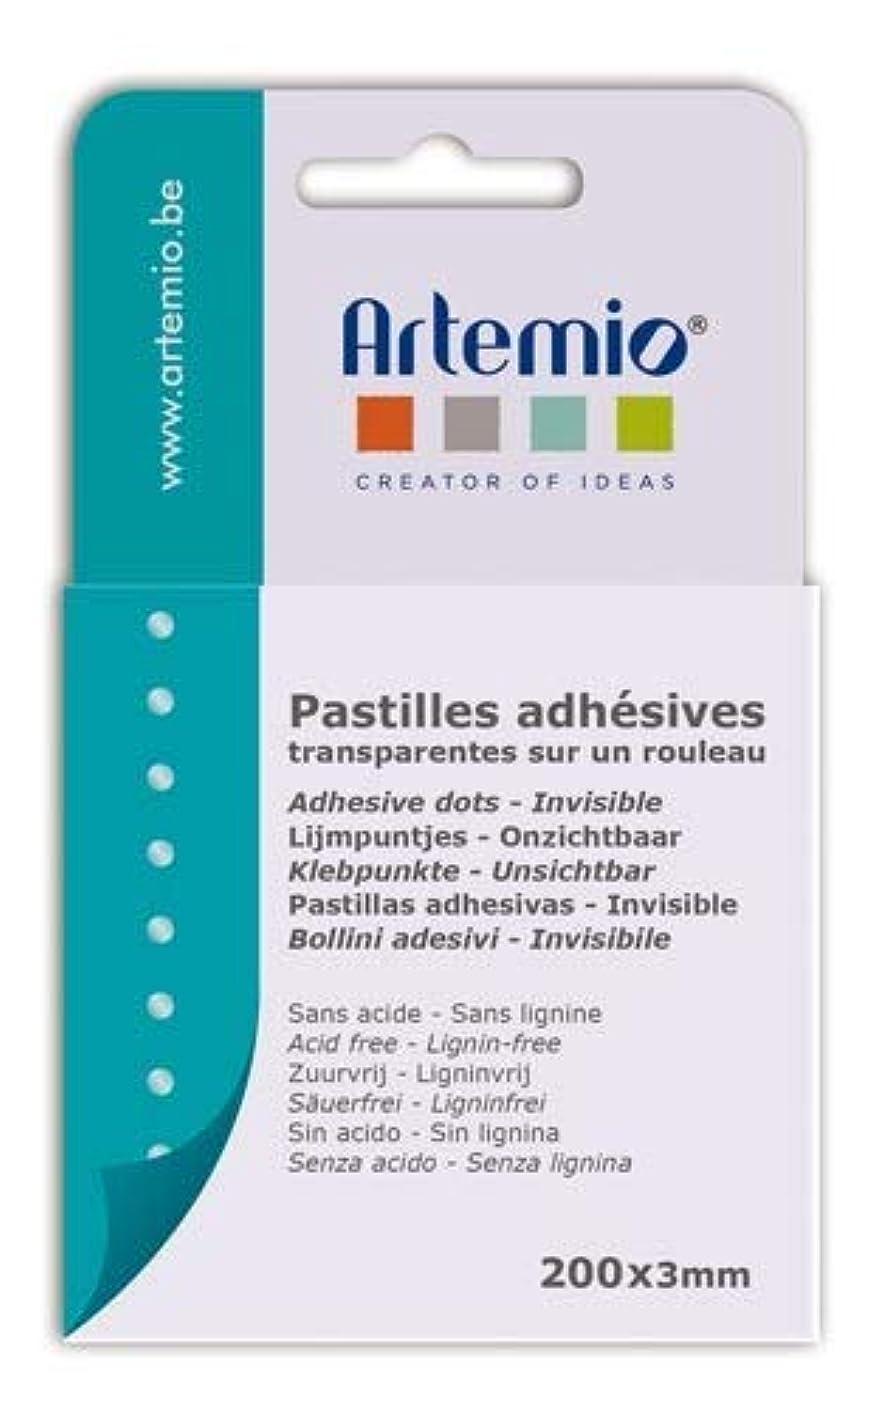 Artemio Set of 300?Clear Adhesive Glue Adhesive, Clear, 8.5?x 2?x 15?cm